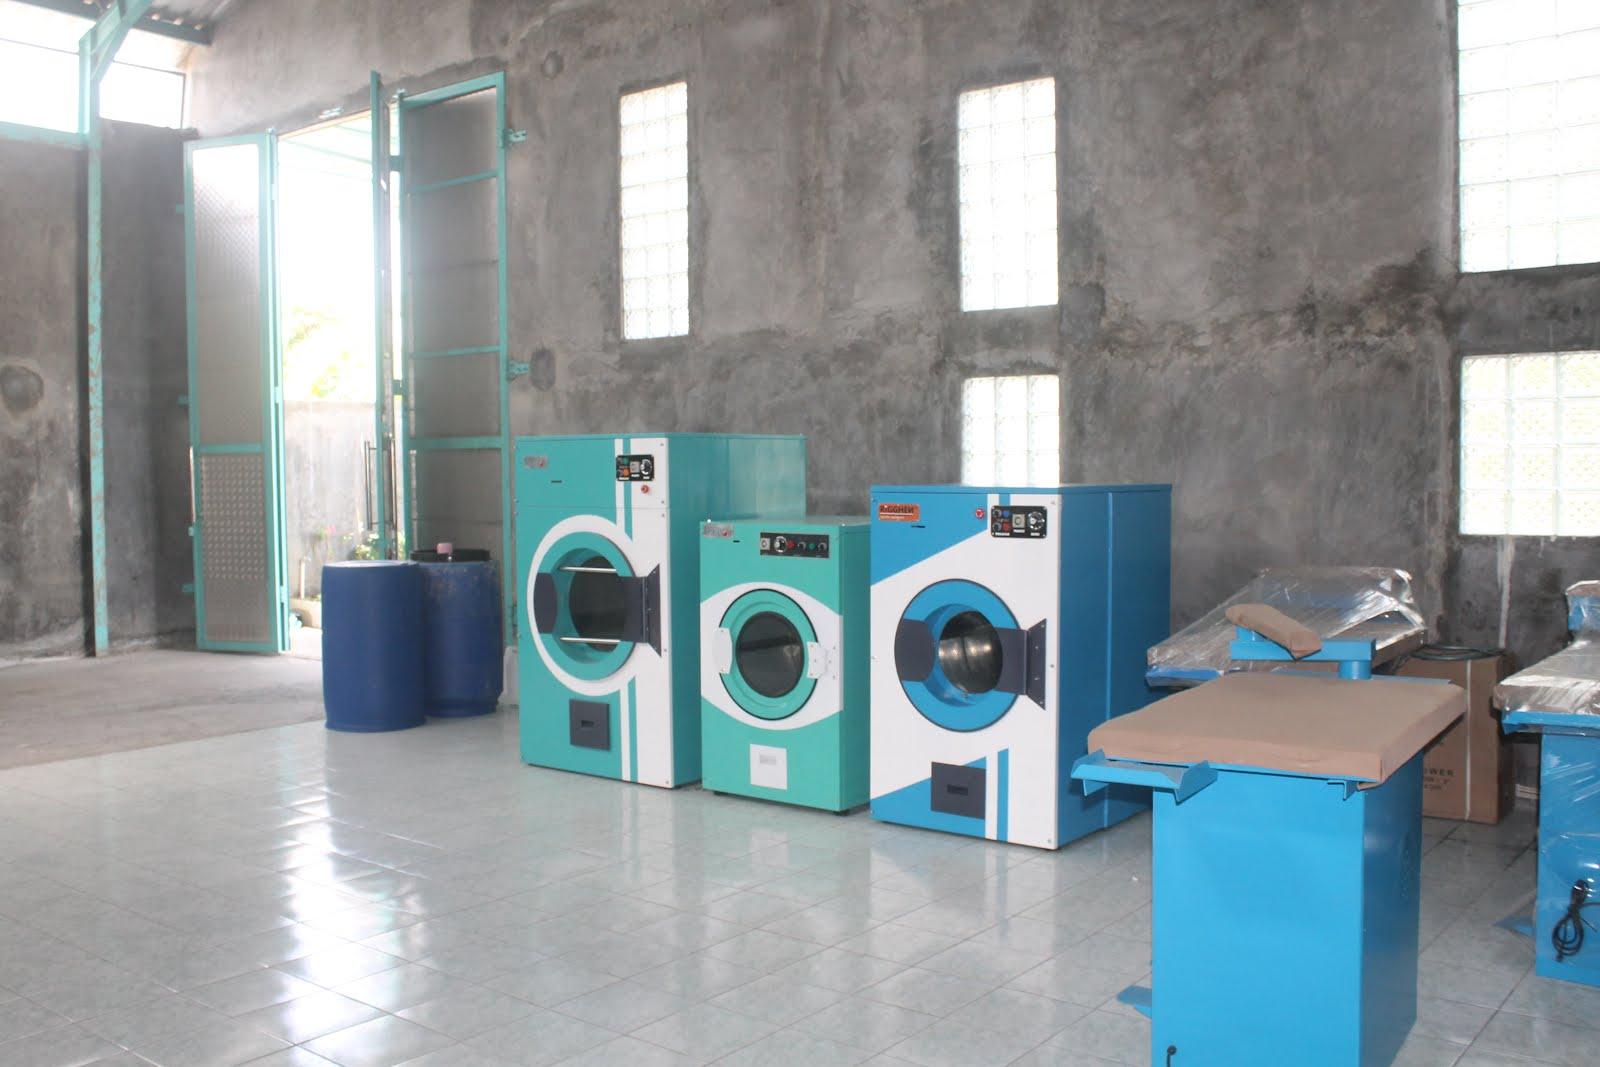 rigghen mesin alat pengering pakaian baju laundry hotel rumah sakit kiloan